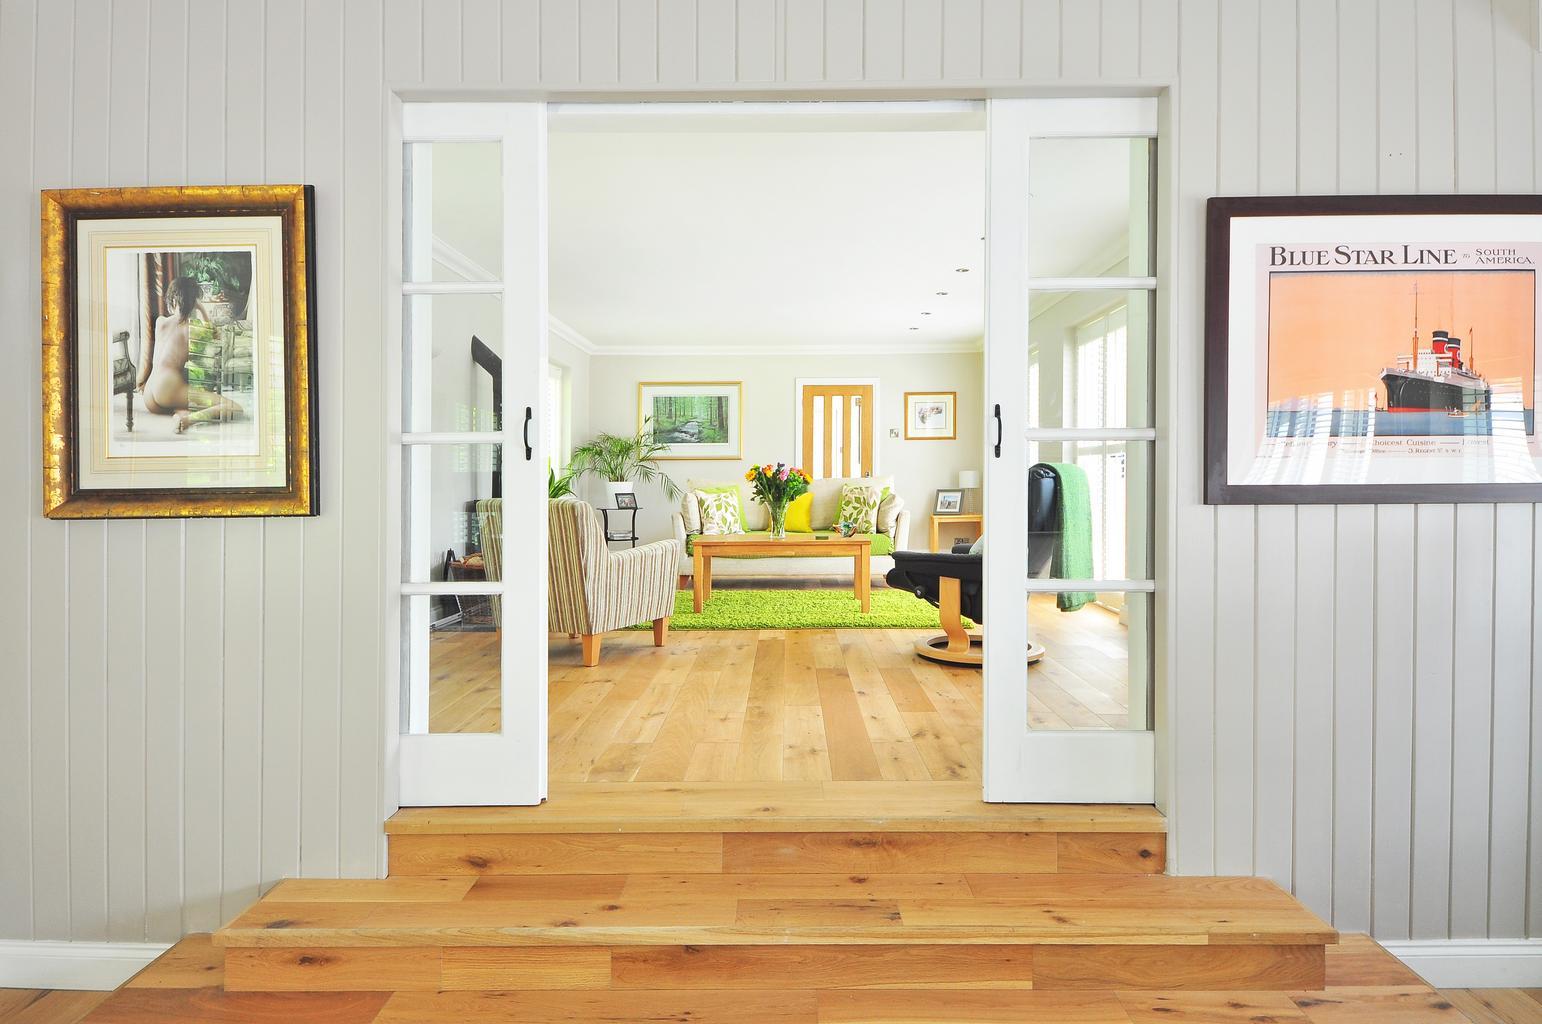 dvere, drevení podlaha